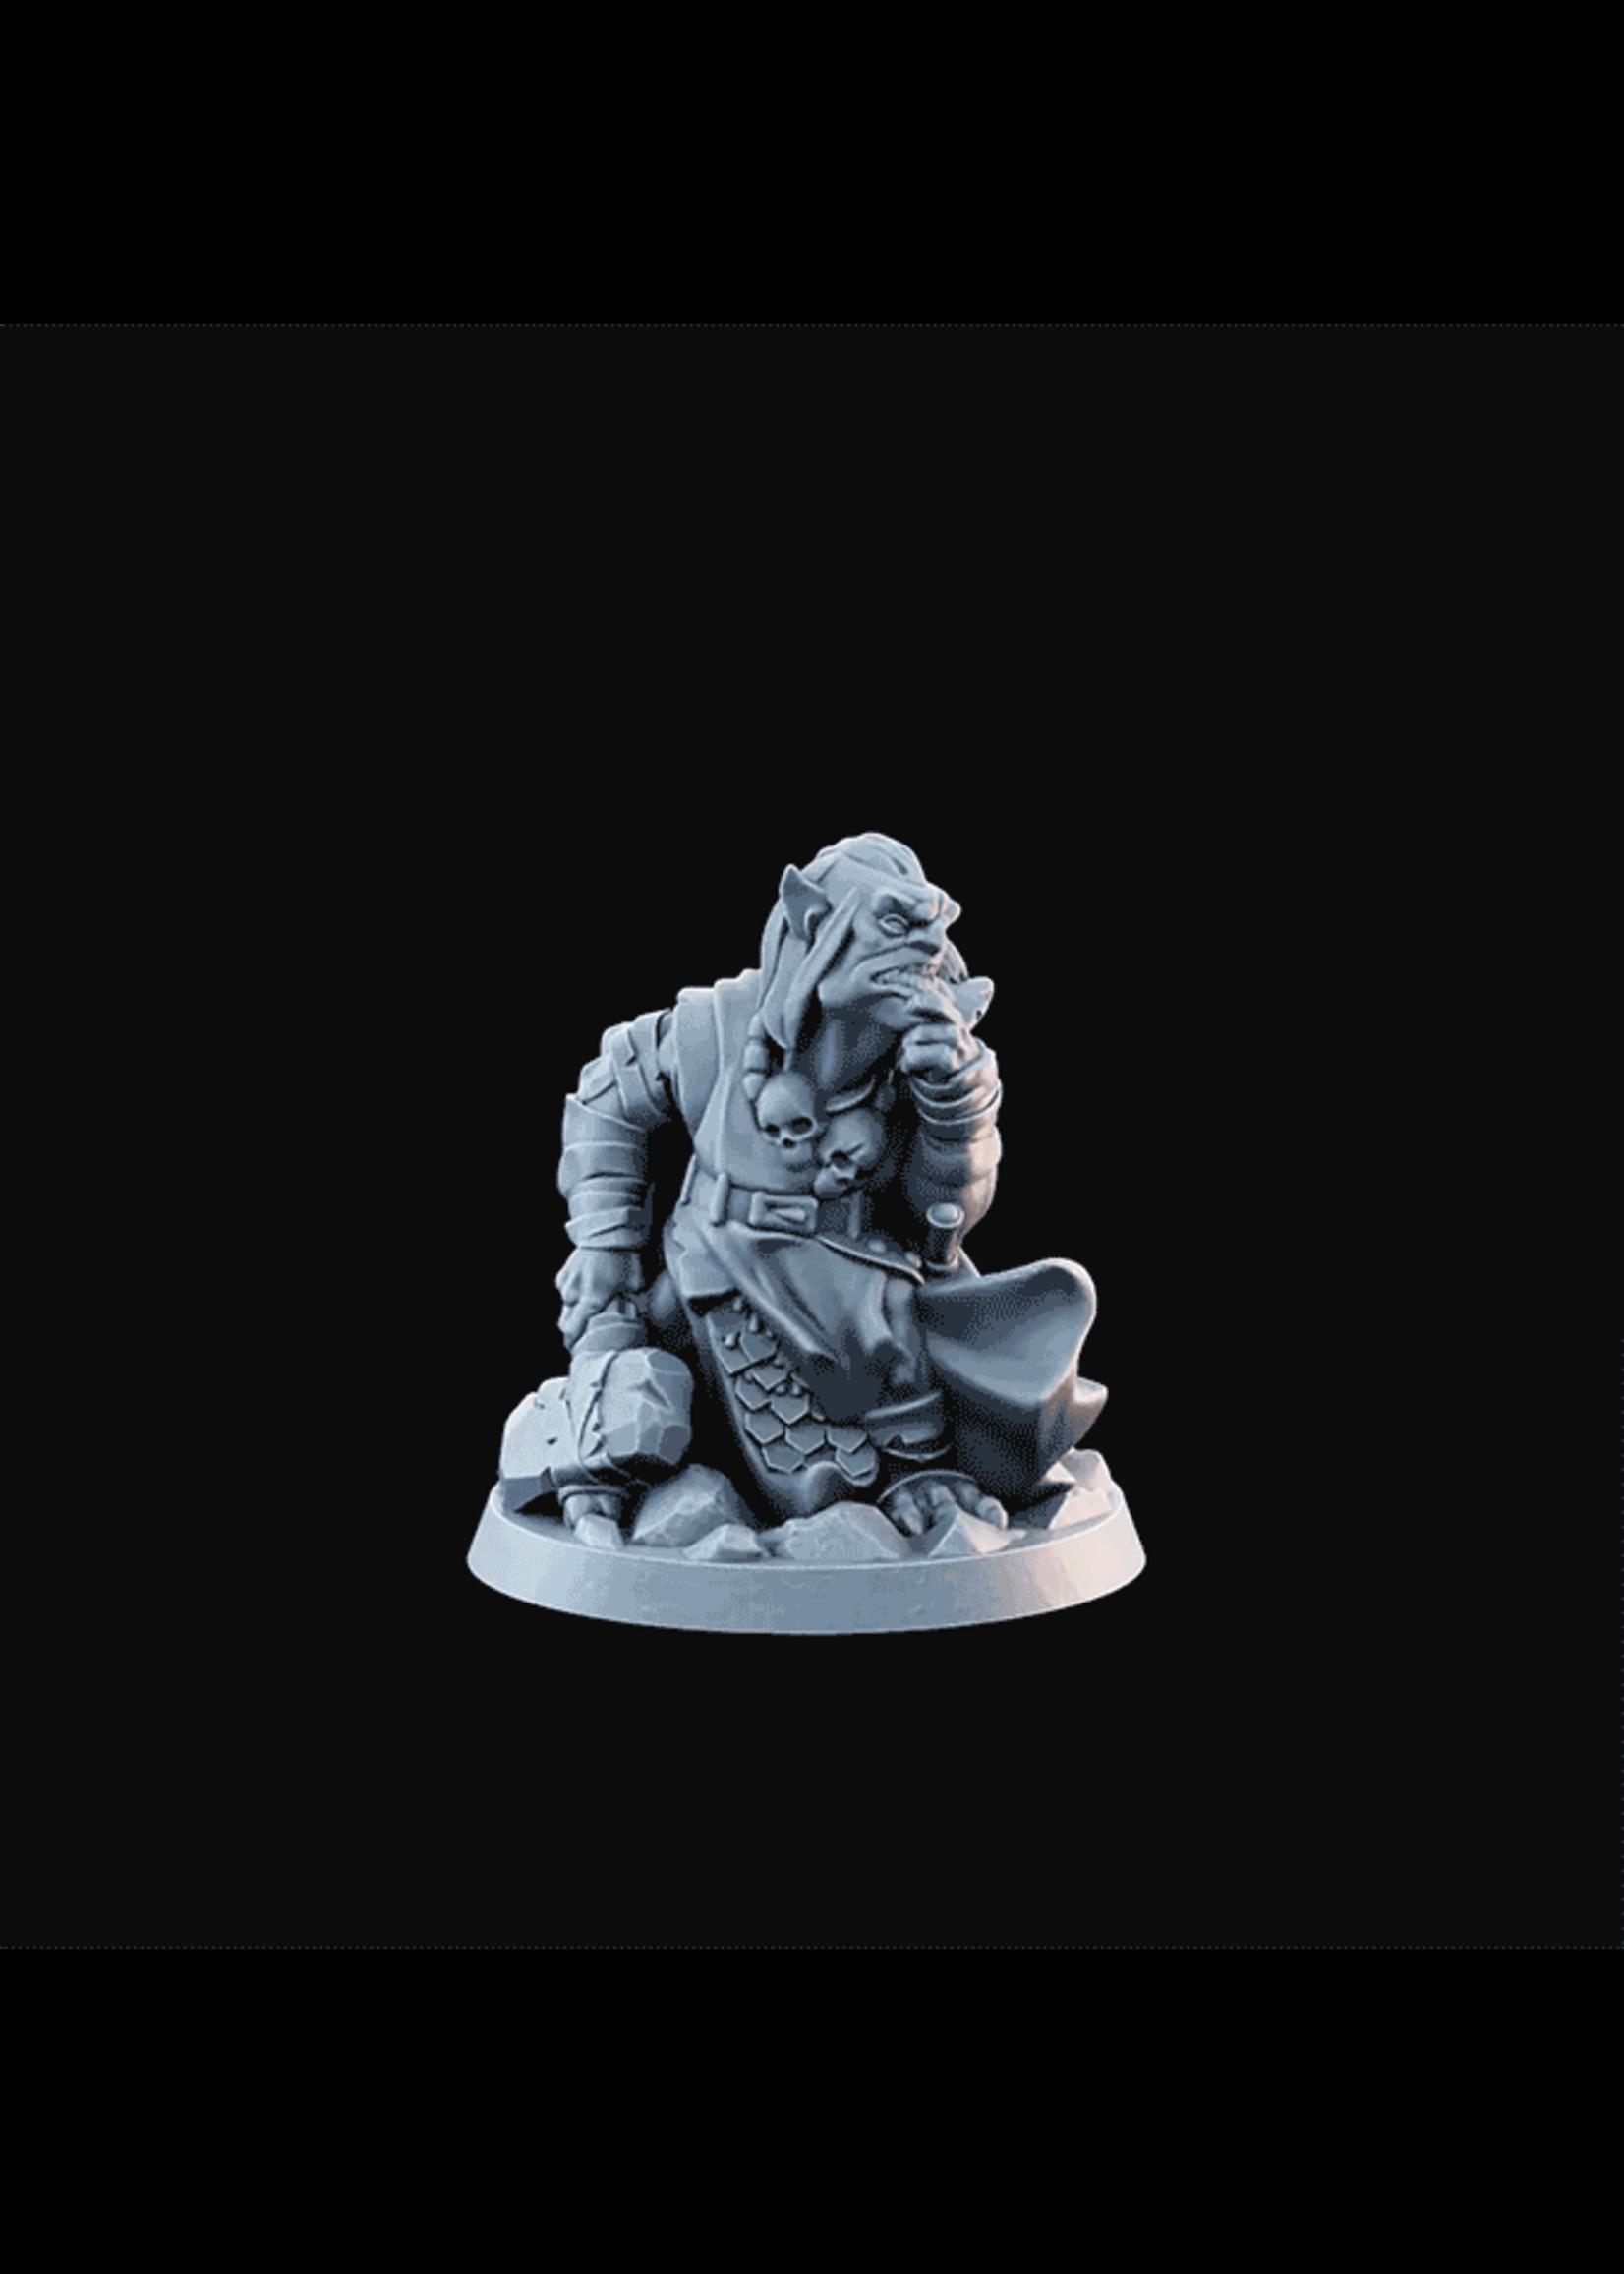 3D Printed Miniature - Goblin04  - Dungeons & Dragons - Desolate Plains KS